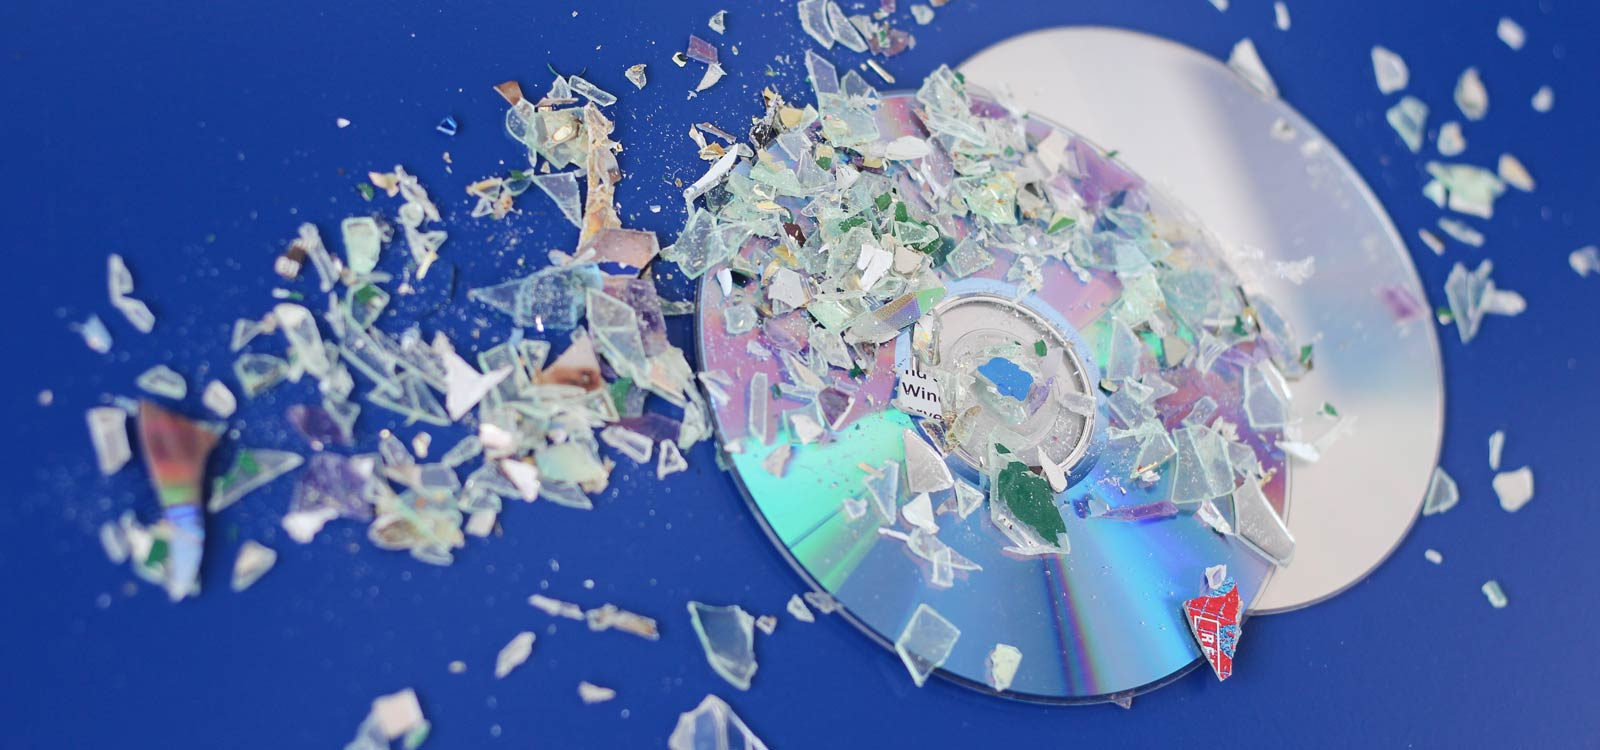 CA+-certificering-voor-betrouwbare-datavernietiging-harddisk-vernietigen-header